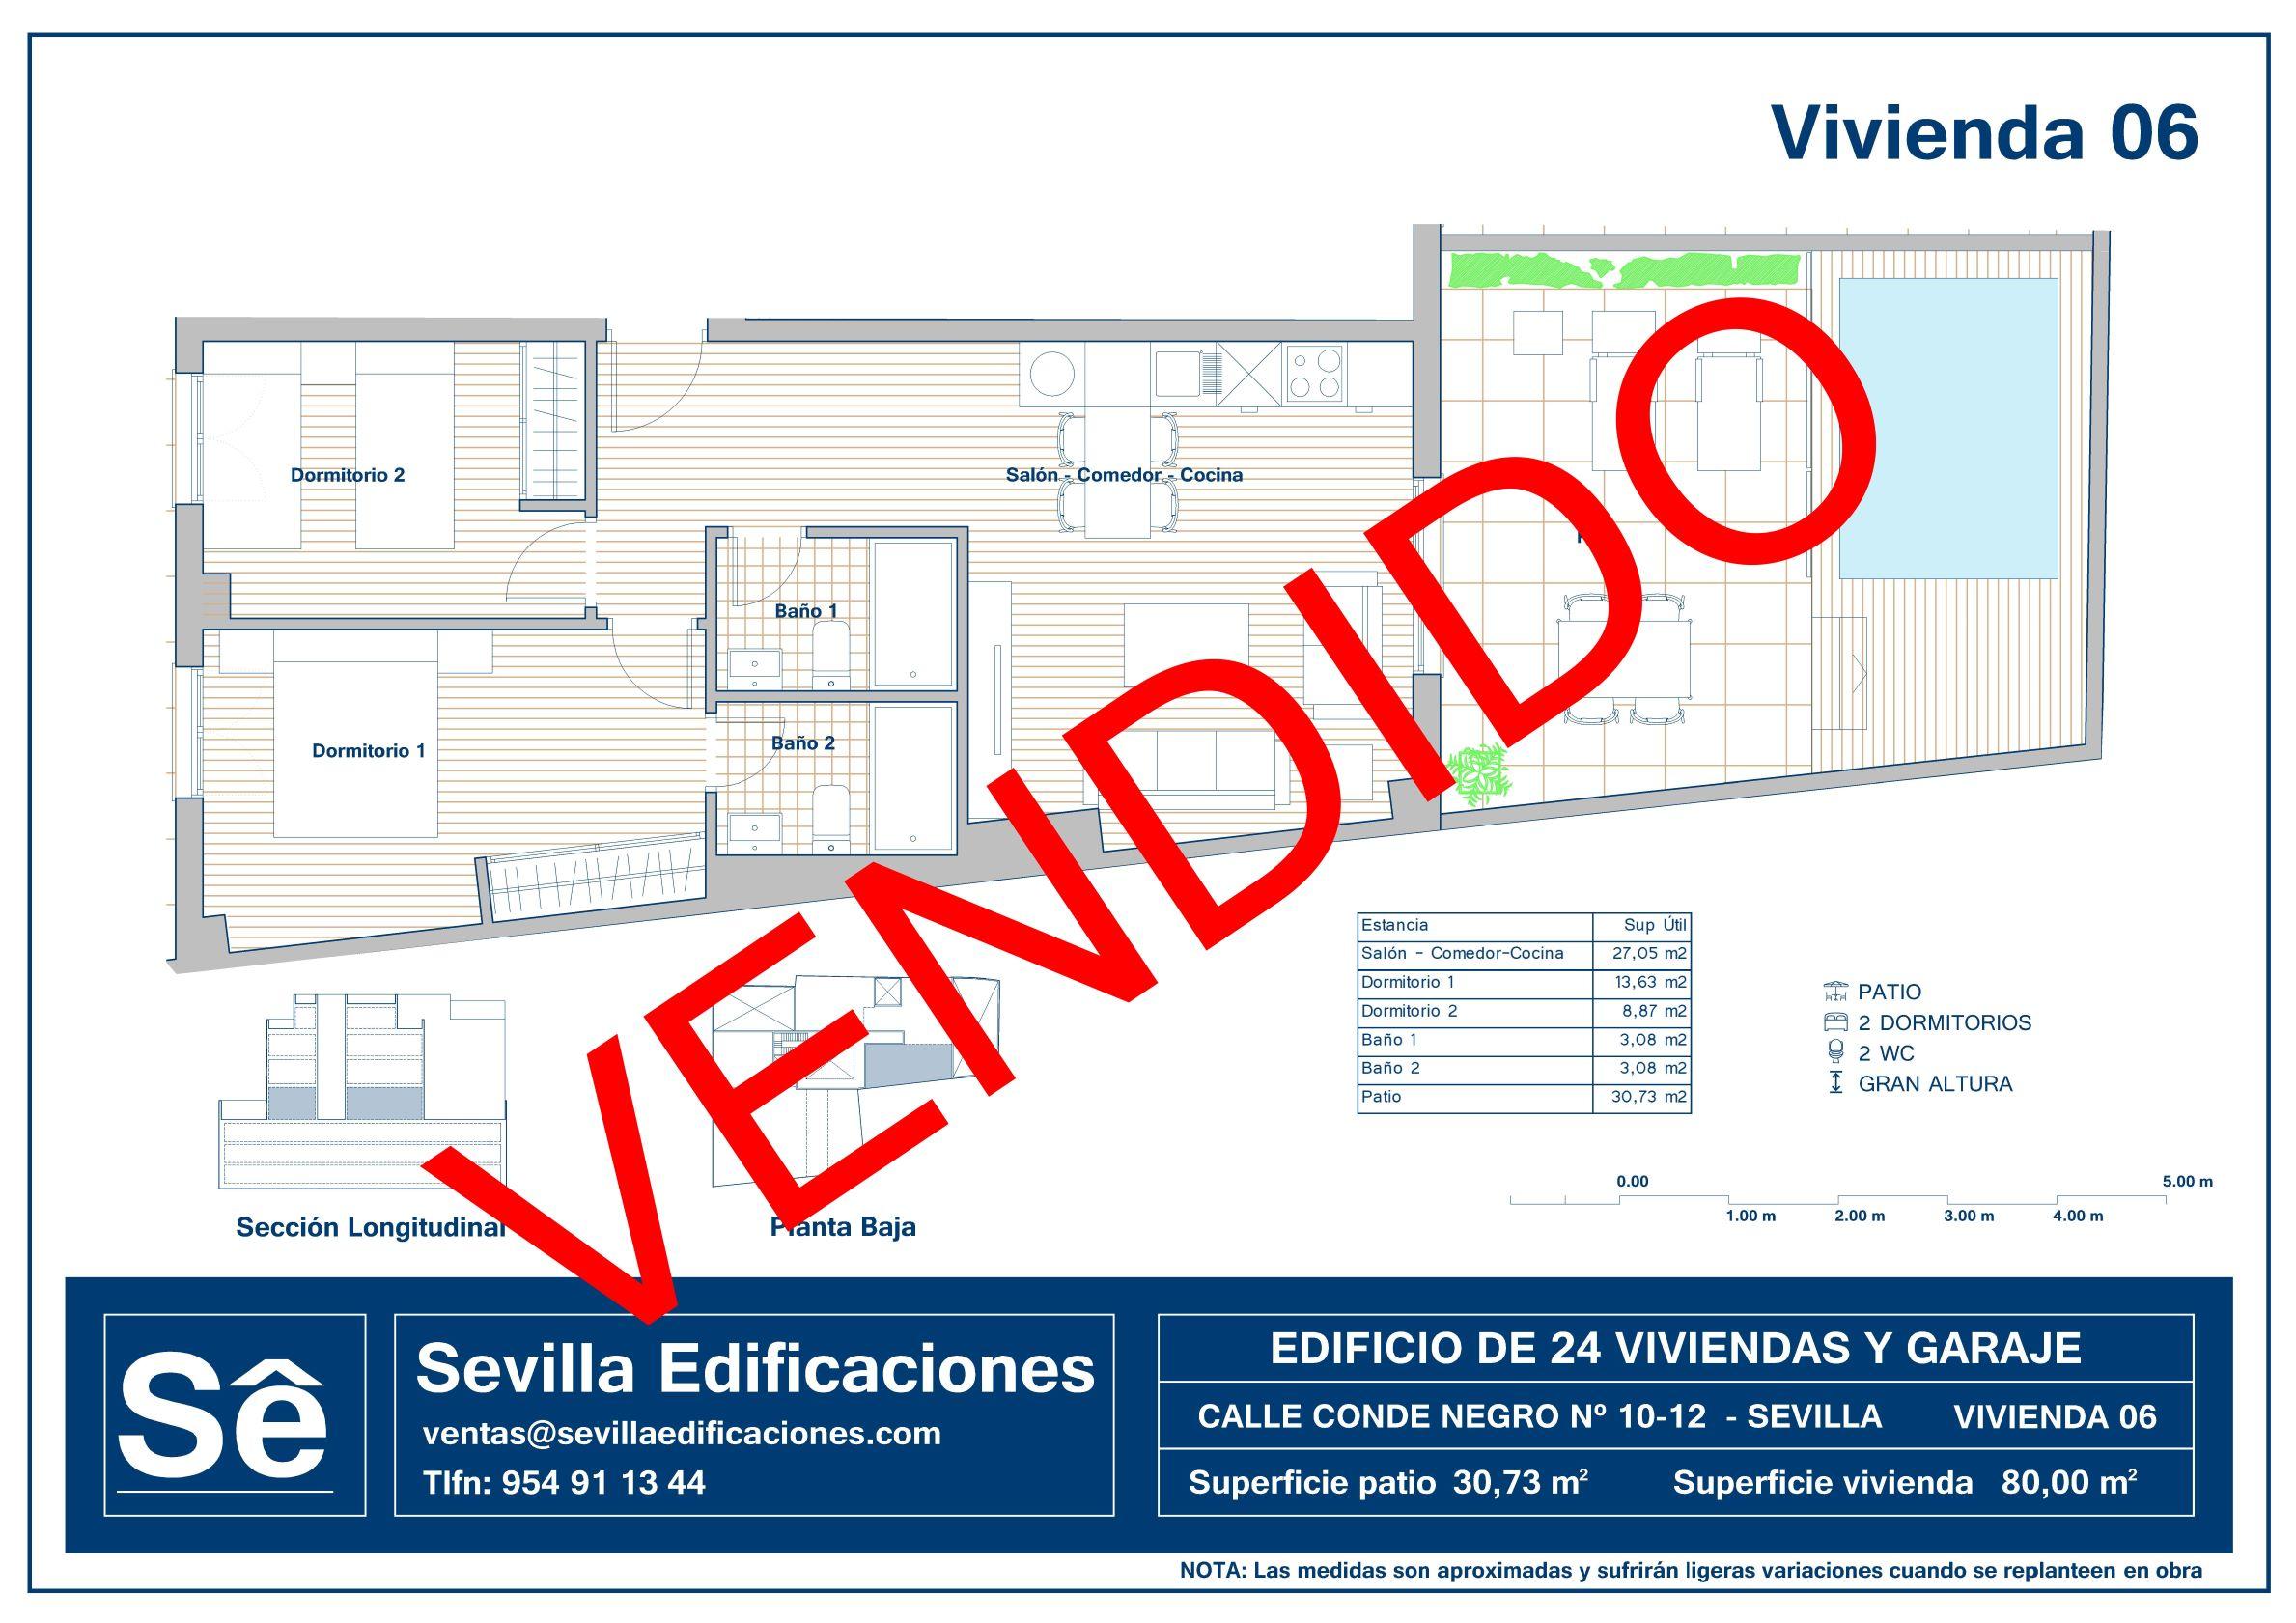 CONDENEGRO_VIVIENDA_06_VENDIDO